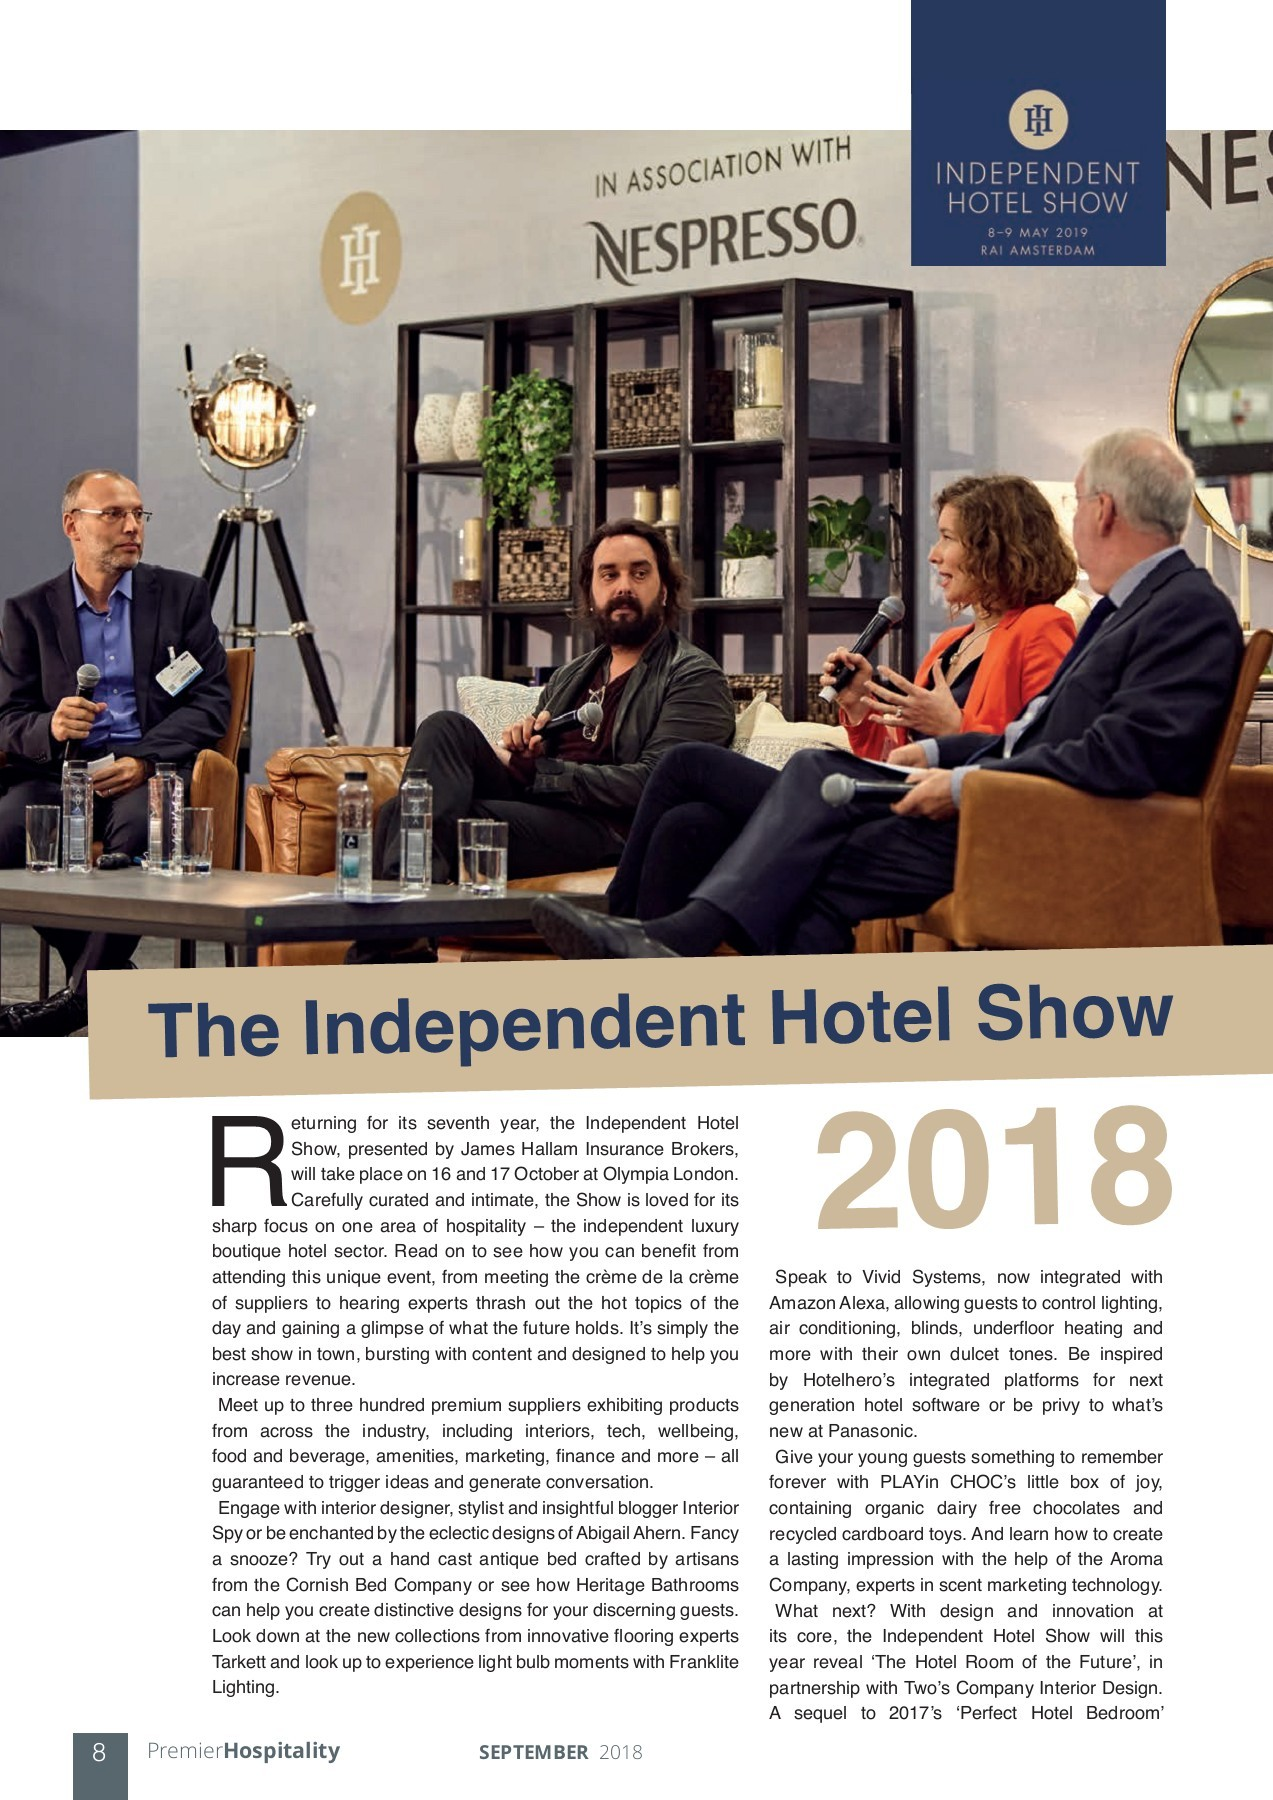 Independent Hotel Show 2018 - Premier Construction News